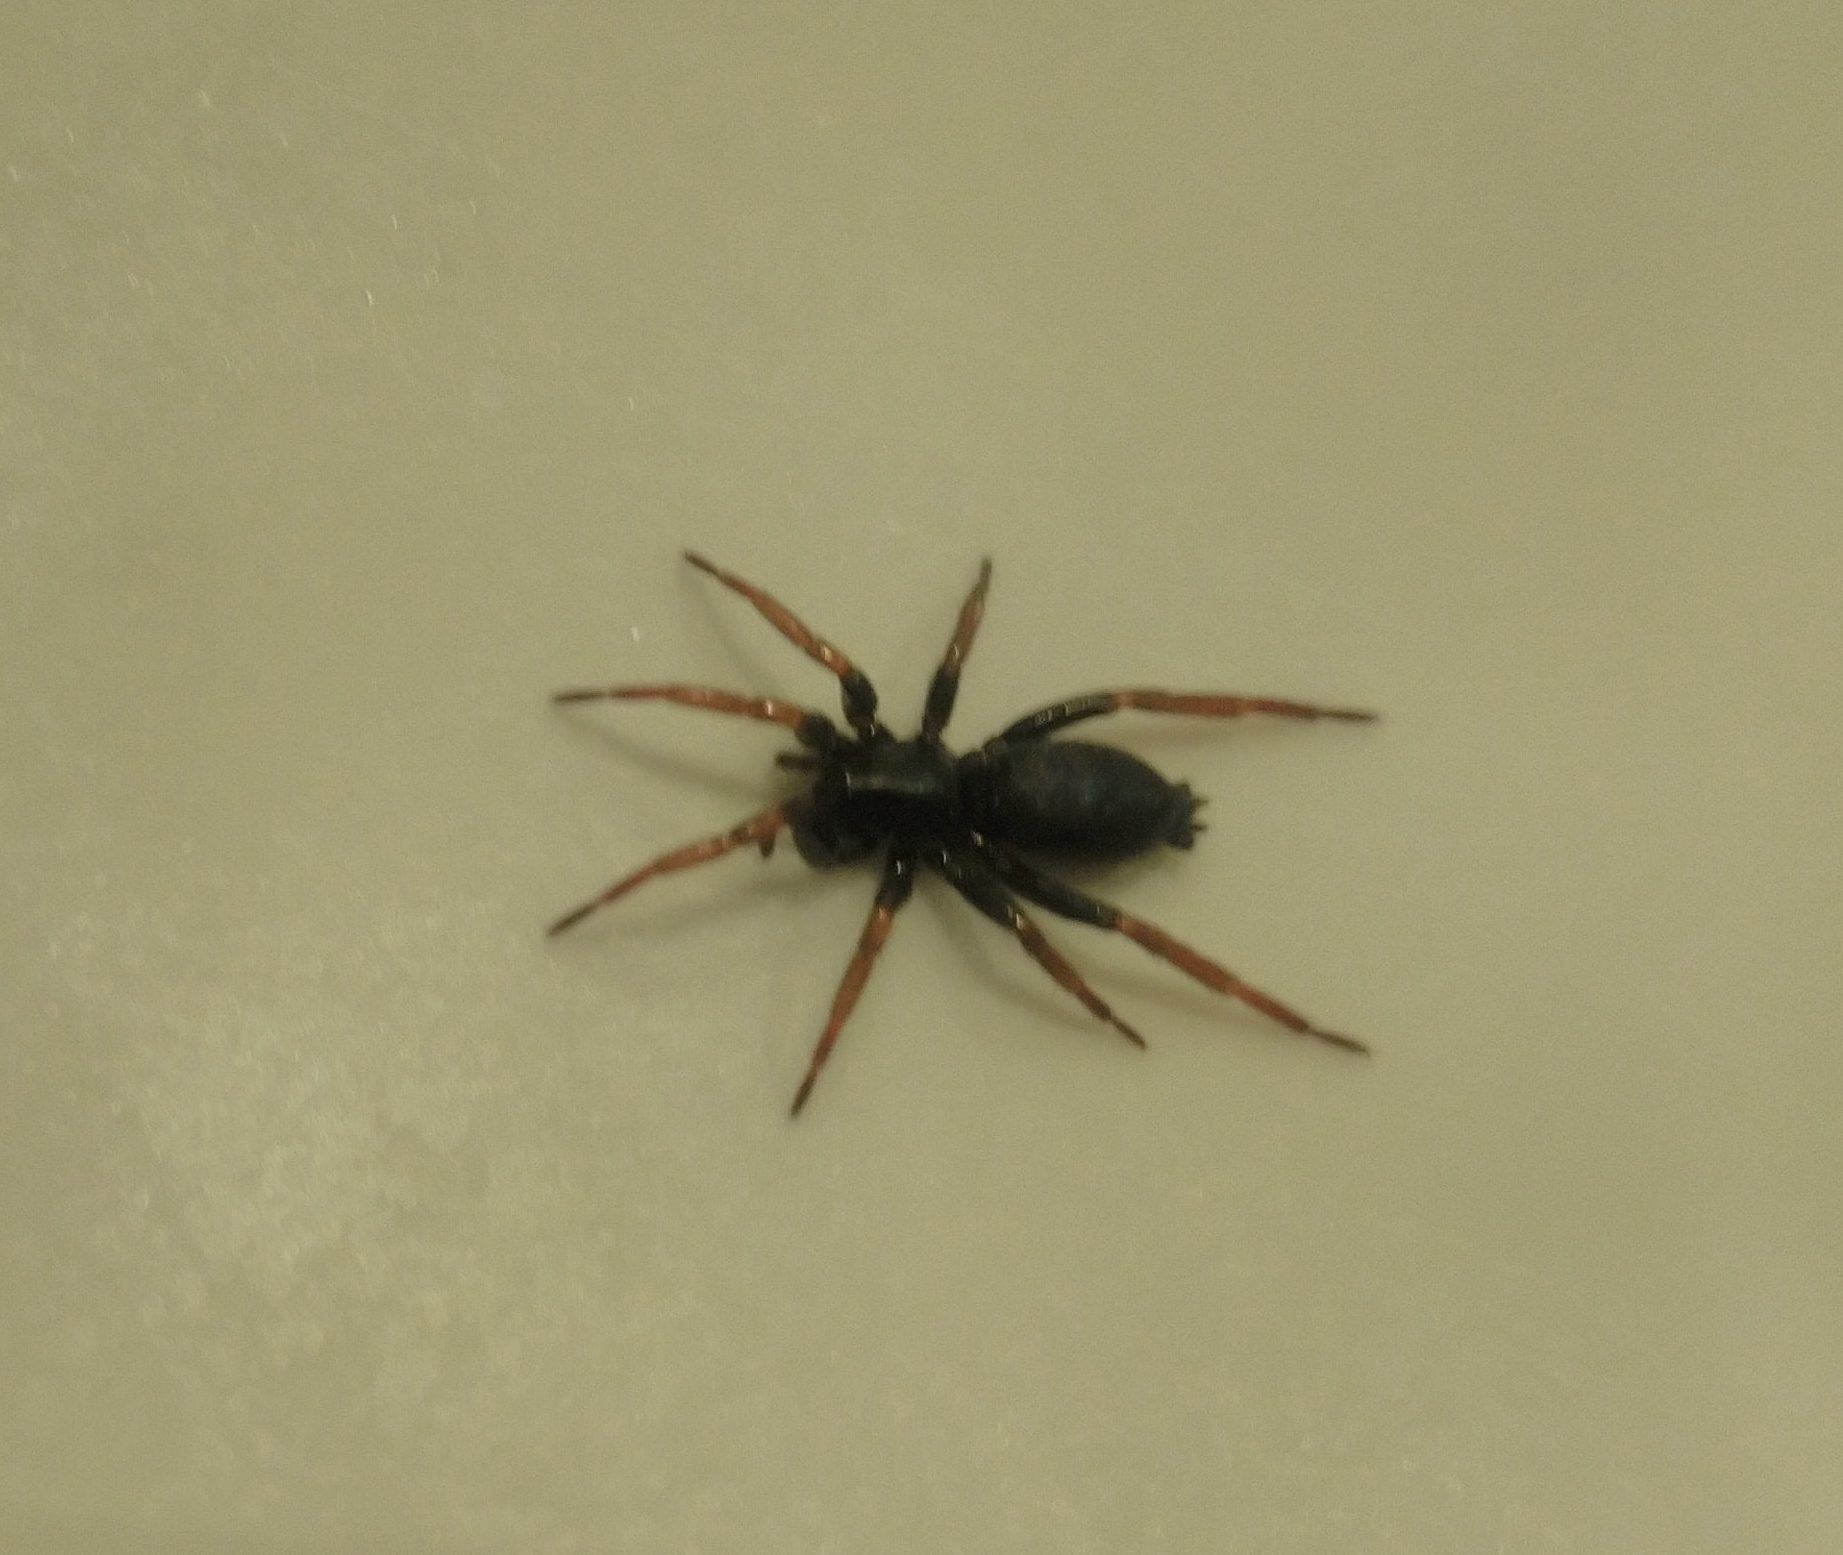 Picture of Trachyzelotes pedestris (Yellow-legged Zipper Spider) - Dorsal